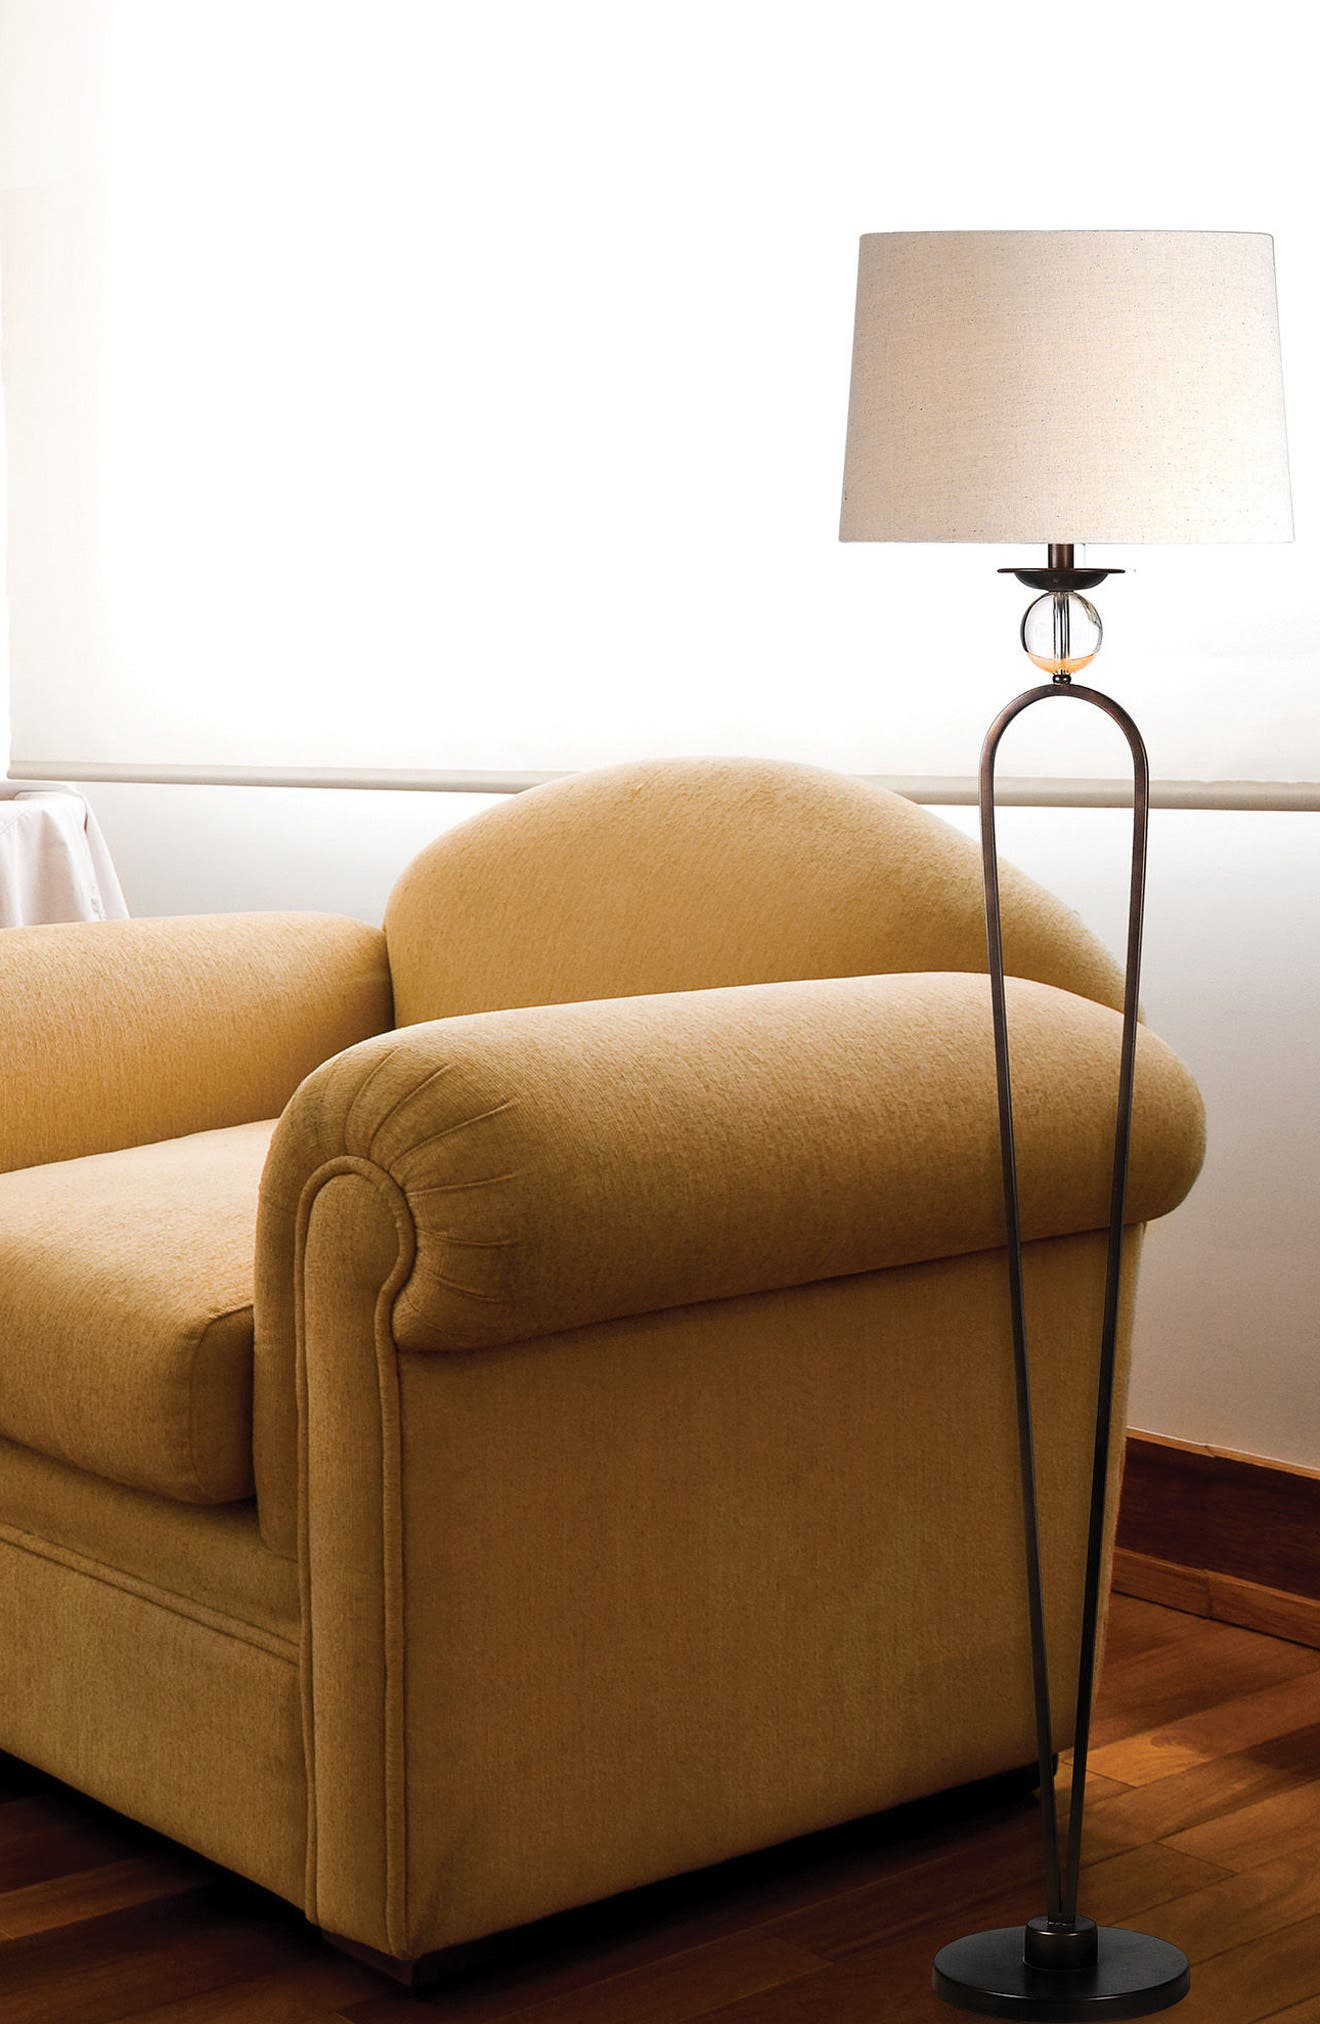 Pembroke Floor Lamp,                             Alternate thumbnail 2, color,                             220